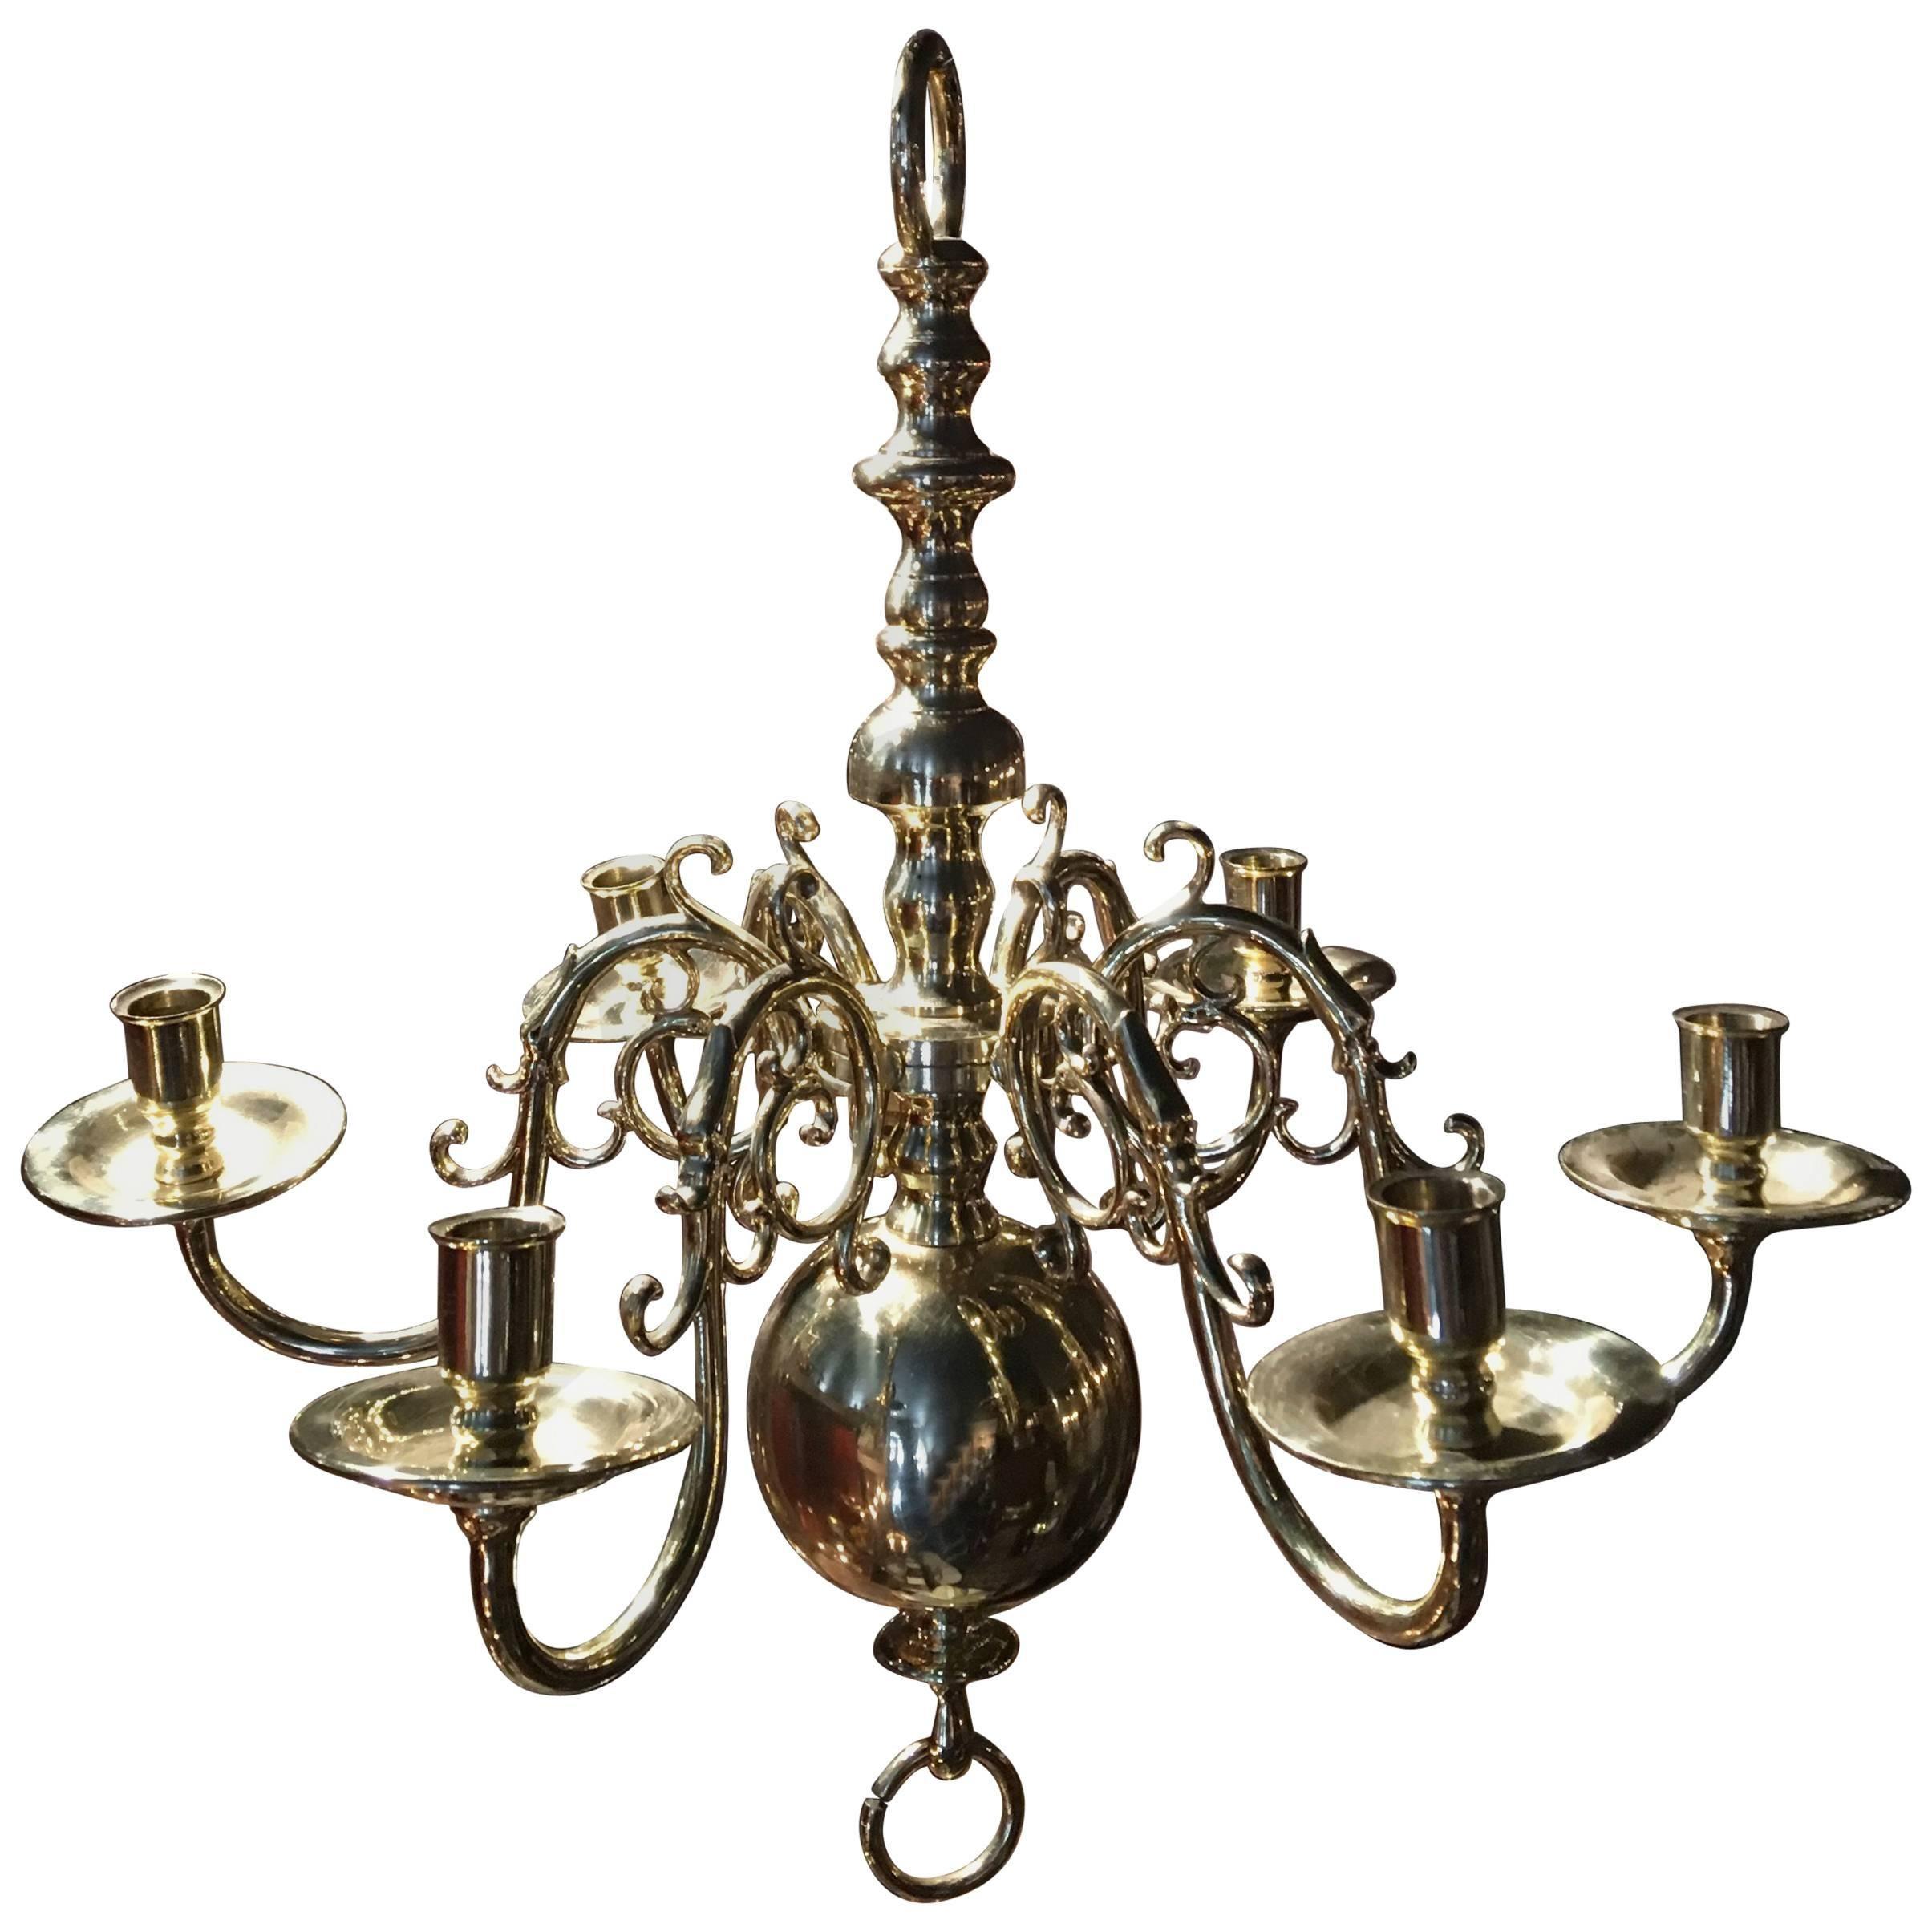 Dutch Style French Polished Brass Six-Light Chandelier, 19th Century